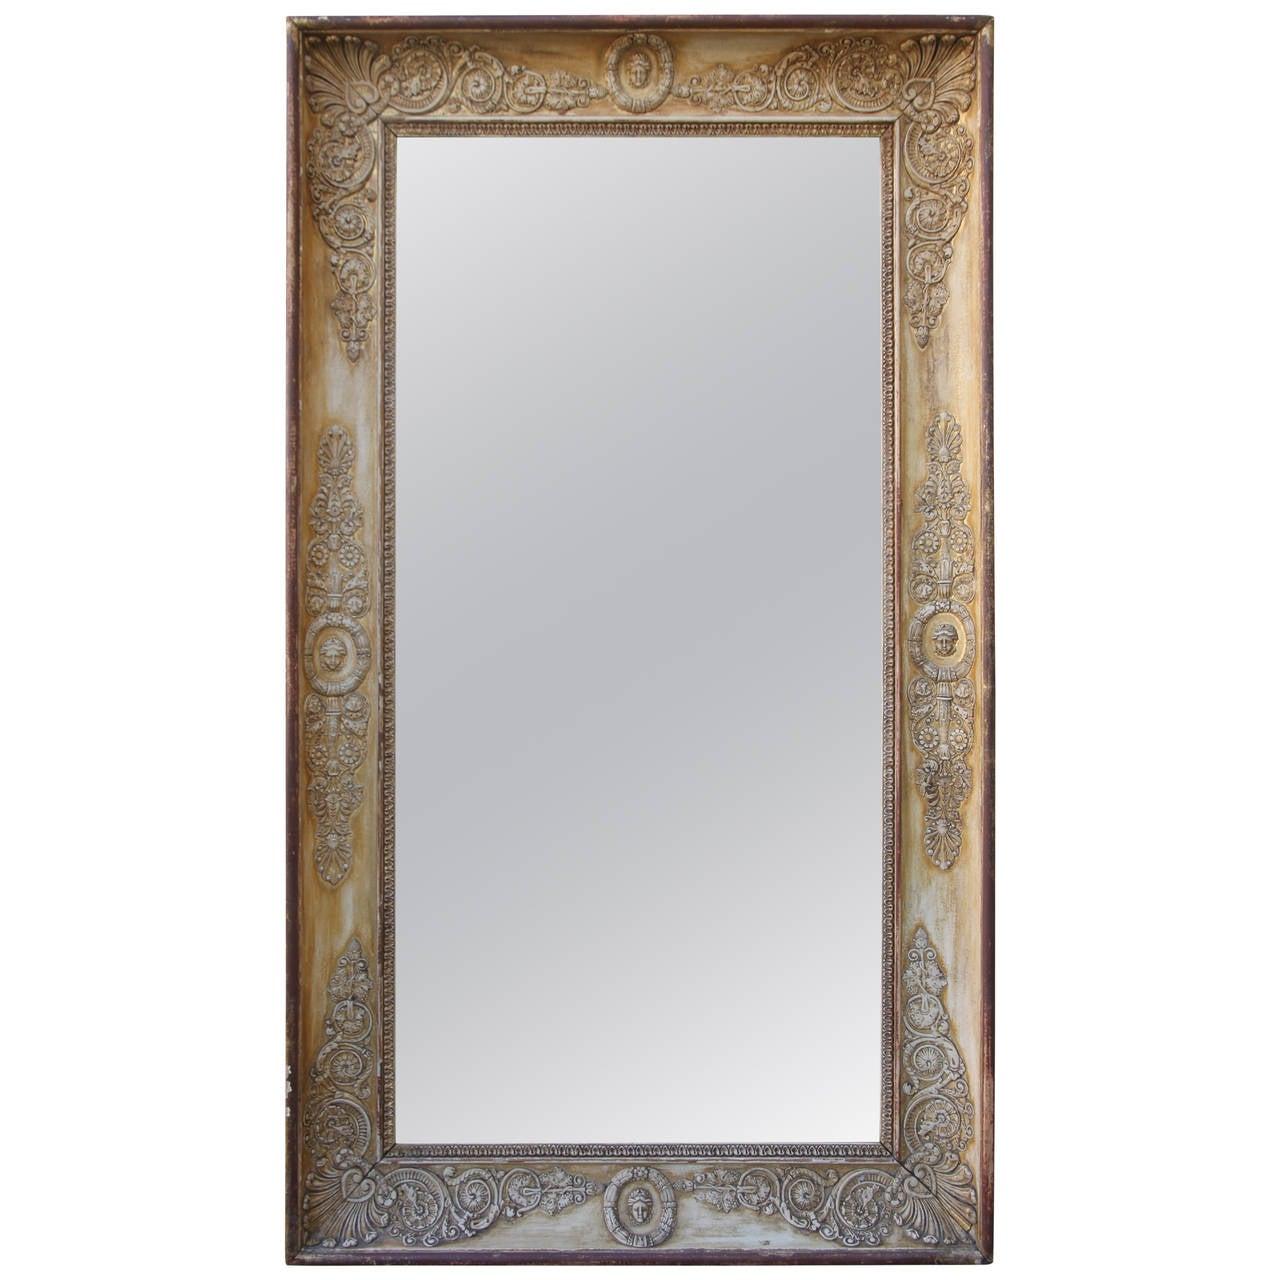 19th Century Italian Giltwood Mirror